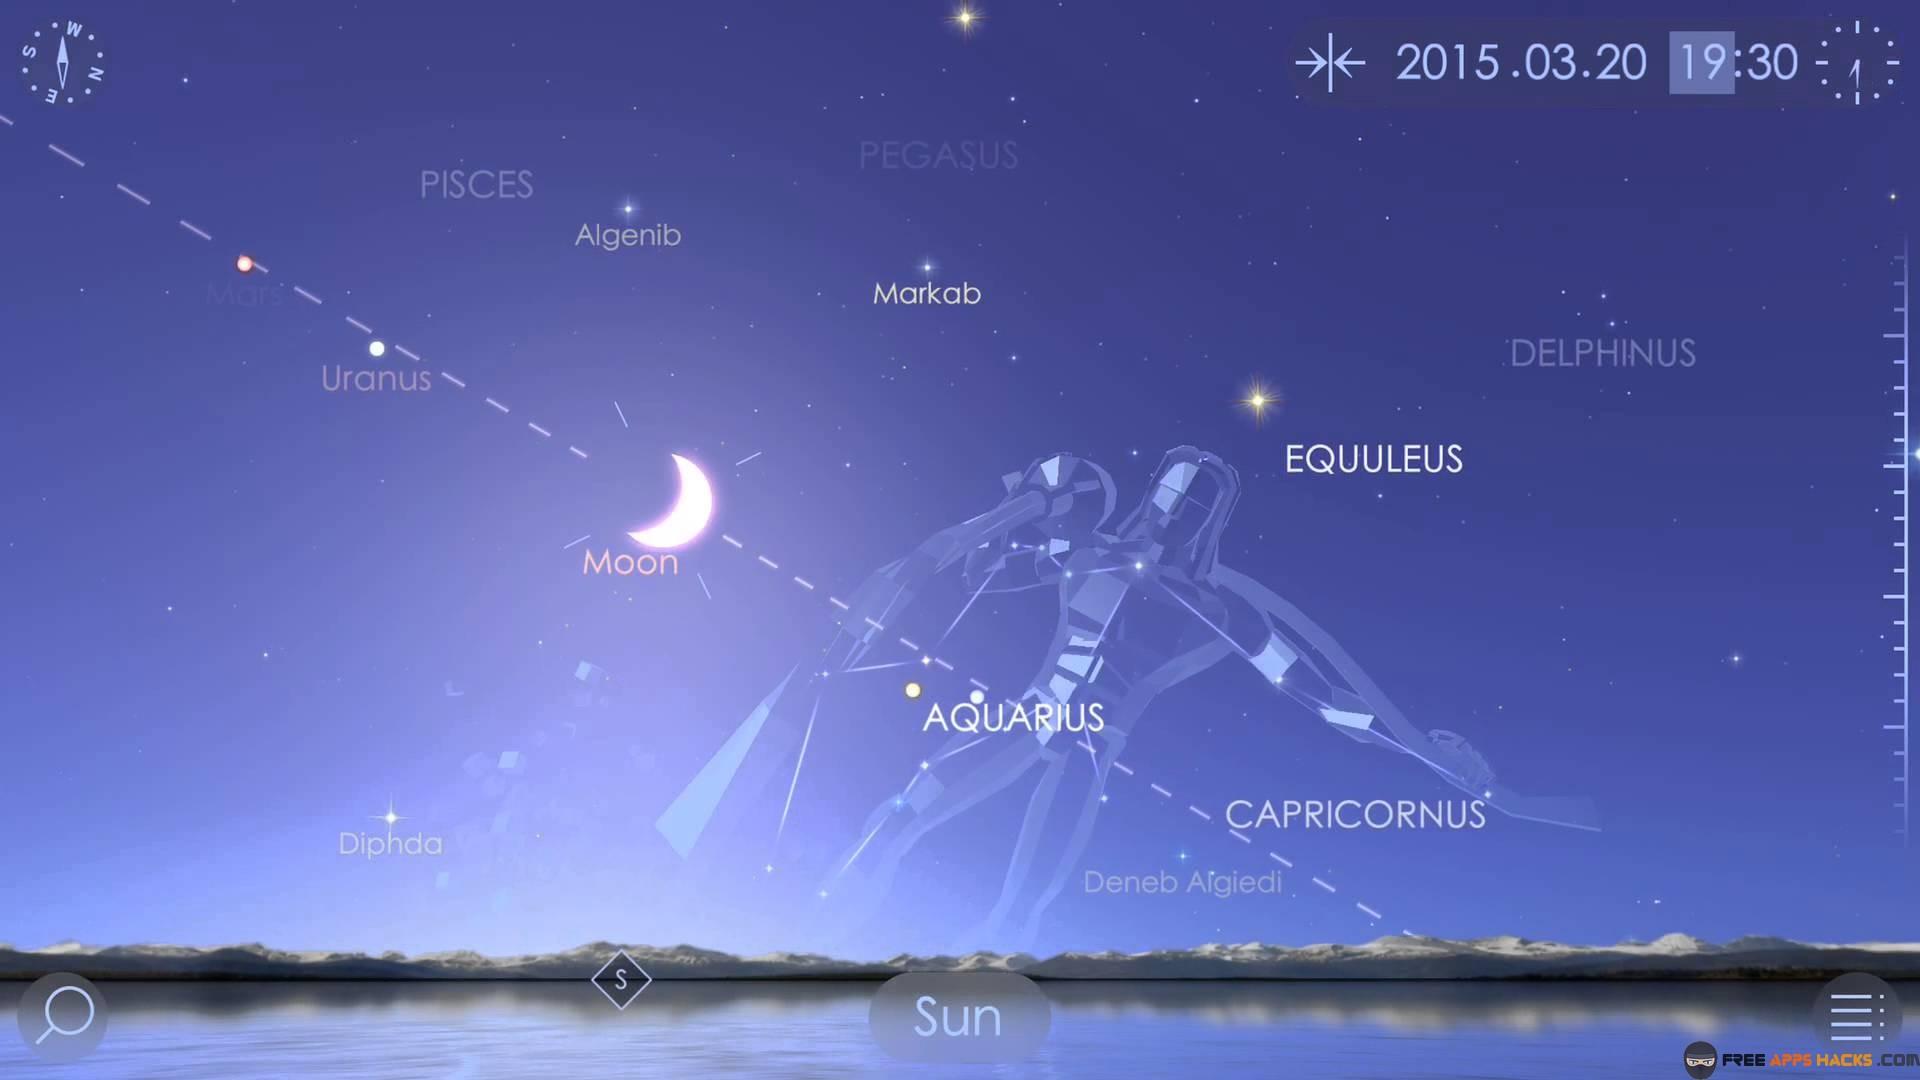 Star chart app ruaya. My-dream. Co.